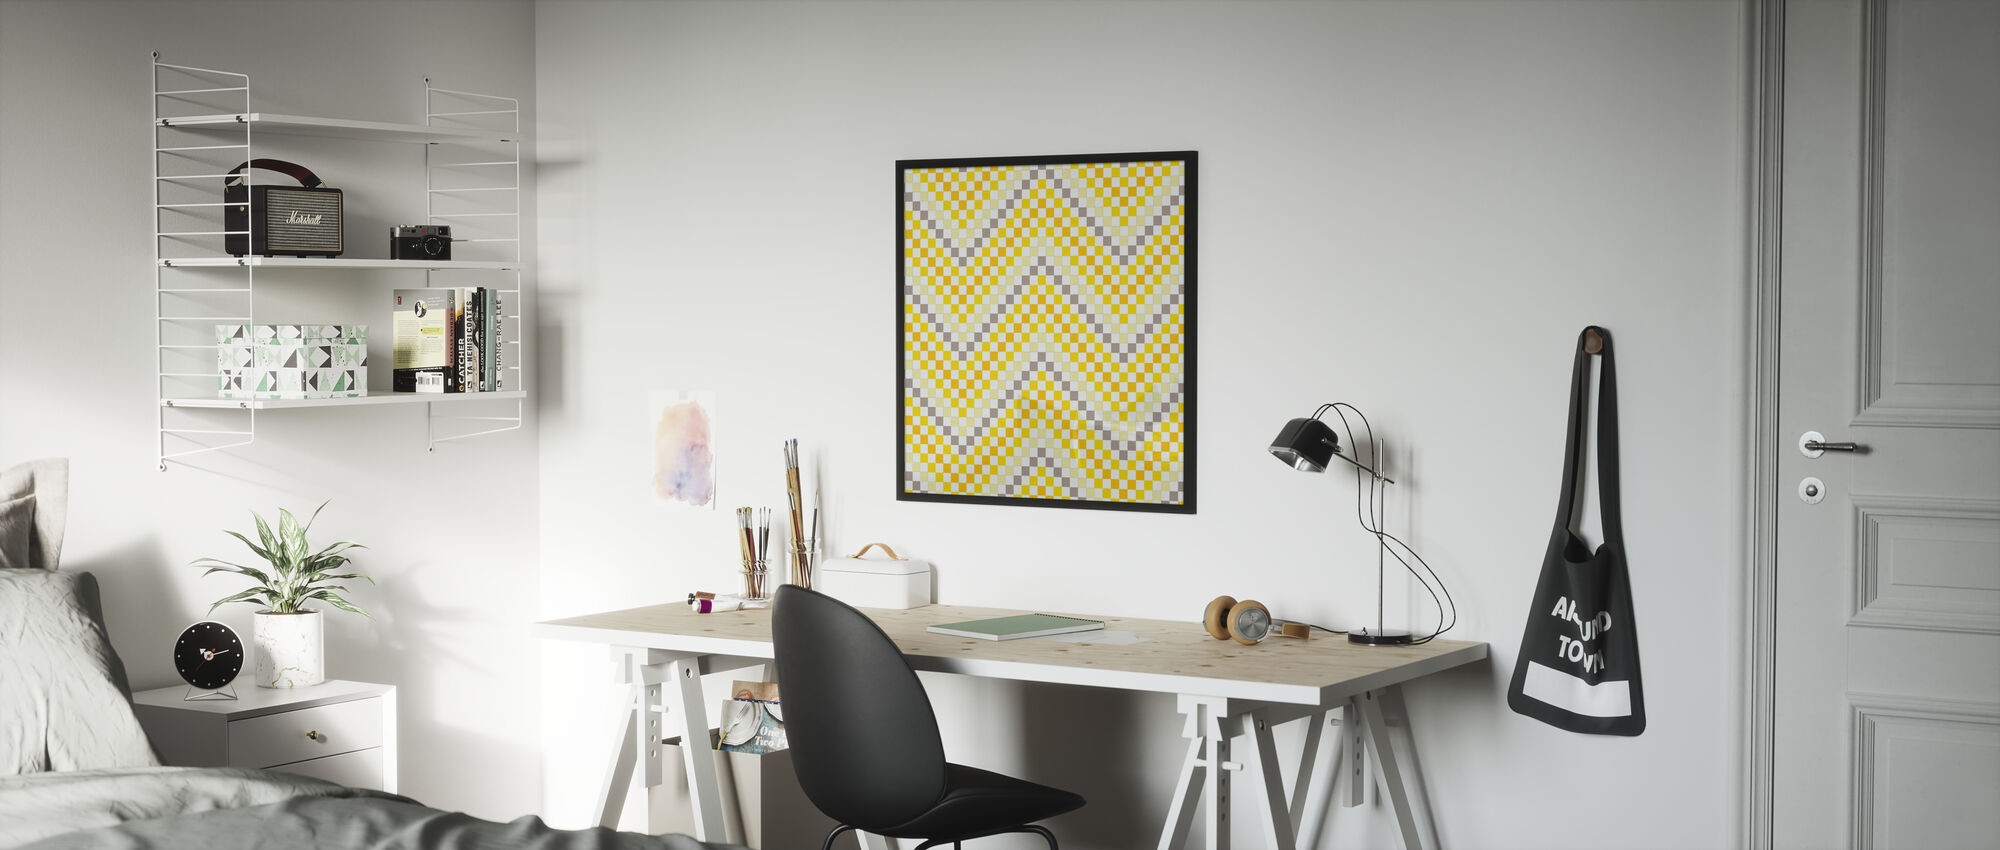 Going Geometric 4 - Poster - Kids Room